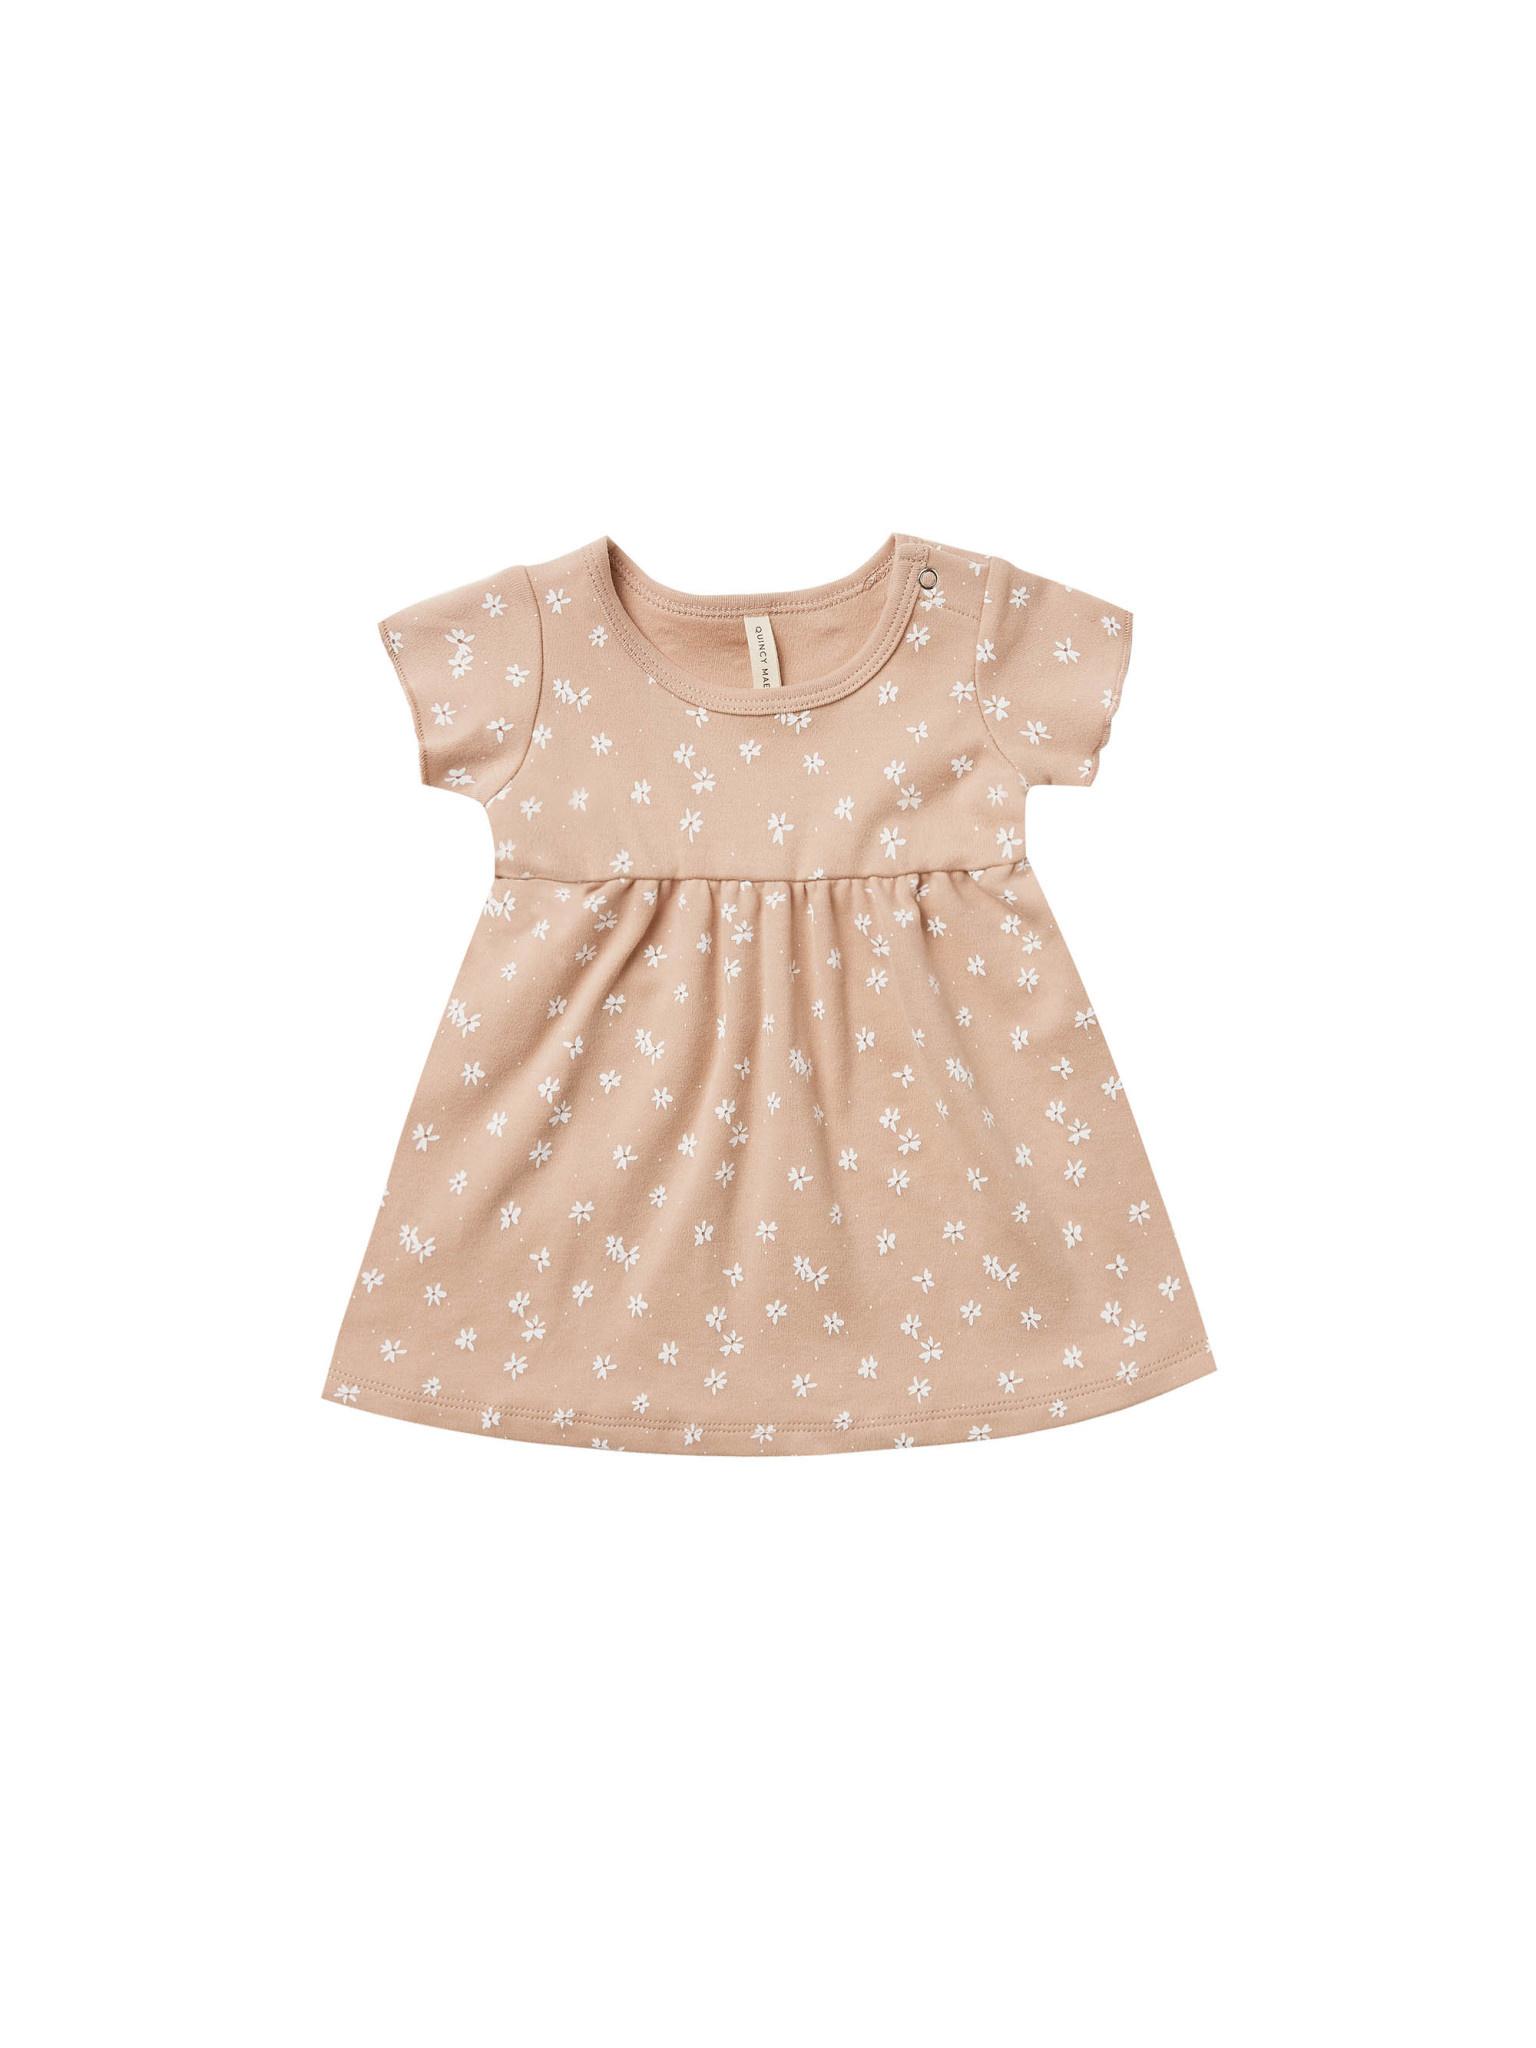 Quincy Mae Short Sleeve Baby Dress - Petal